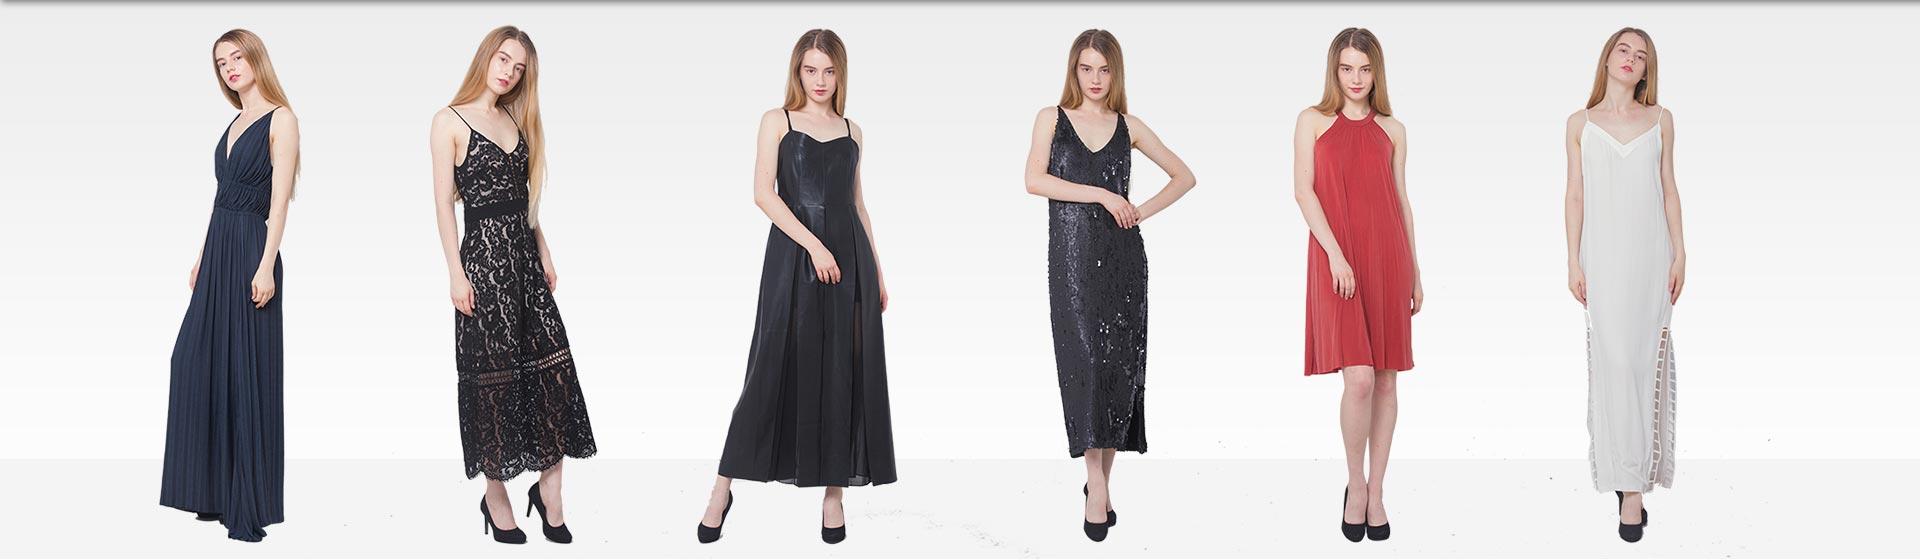 lady dress manufacturer